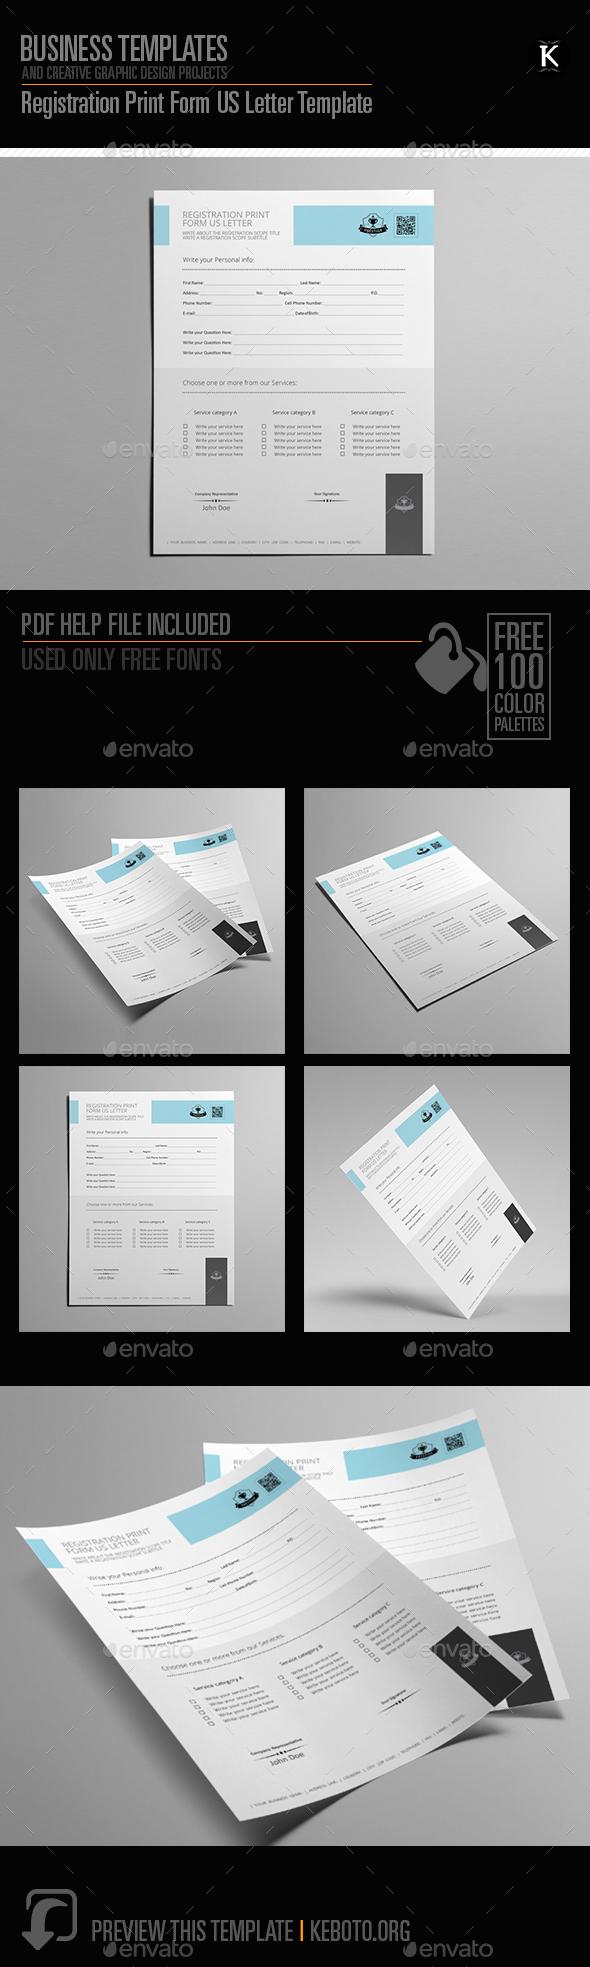 Registration Print Form US Letter Template - Miscellaneous Print Templates